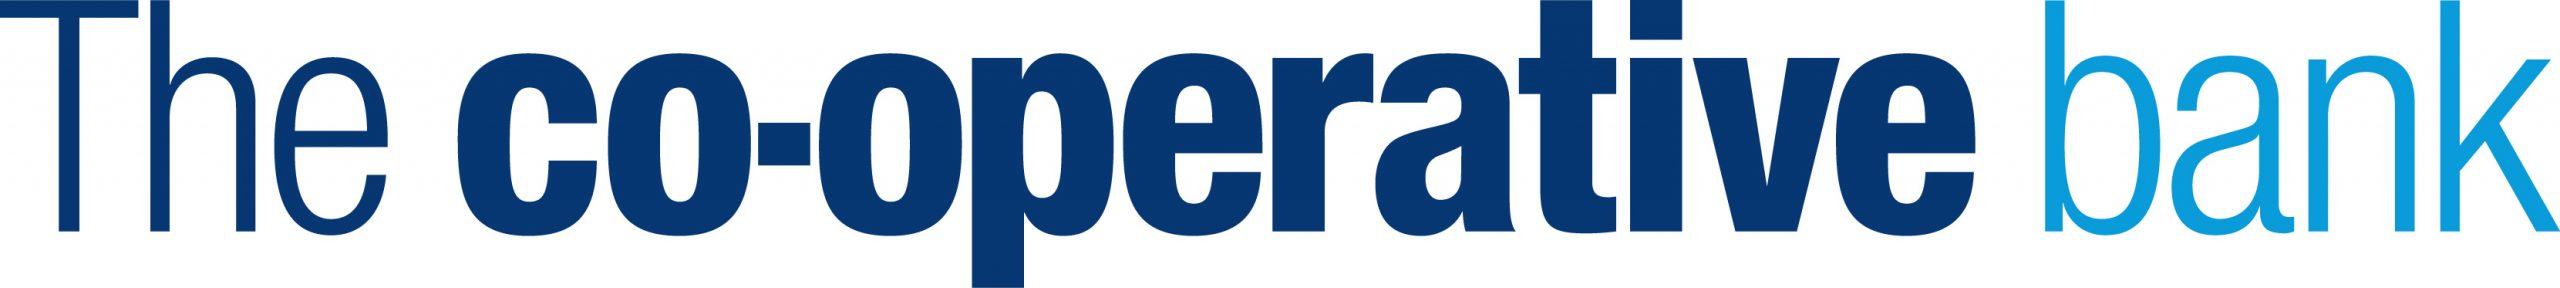 The-Co-operative-Bank-Logo-Blue